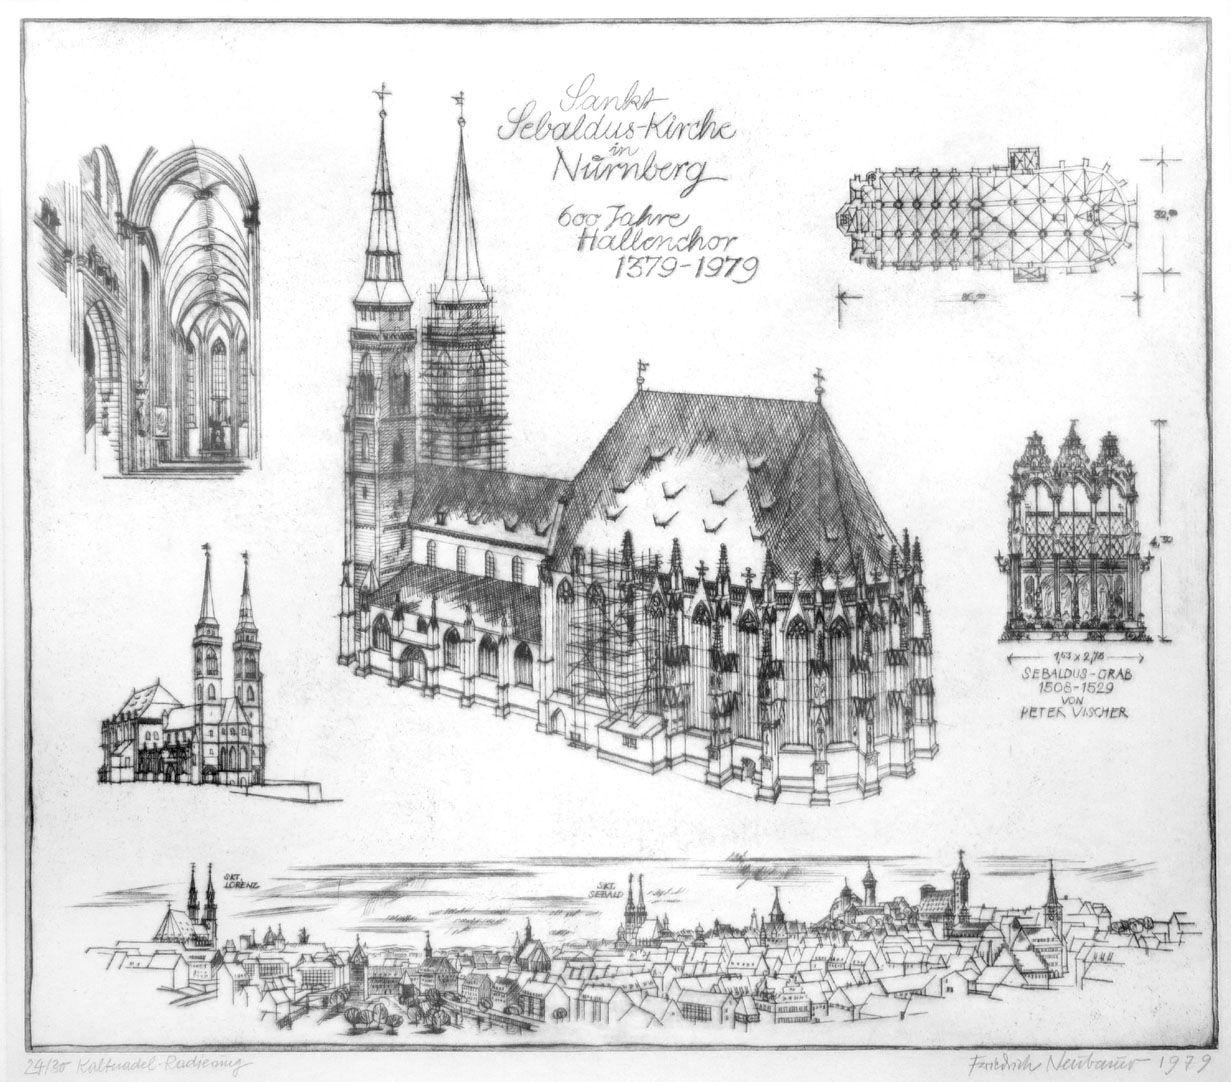 Sankt Sebalduskirche in Nürnberg, 600 Jahre Hallenchor, 1379 - 1979 Gesamtansicht